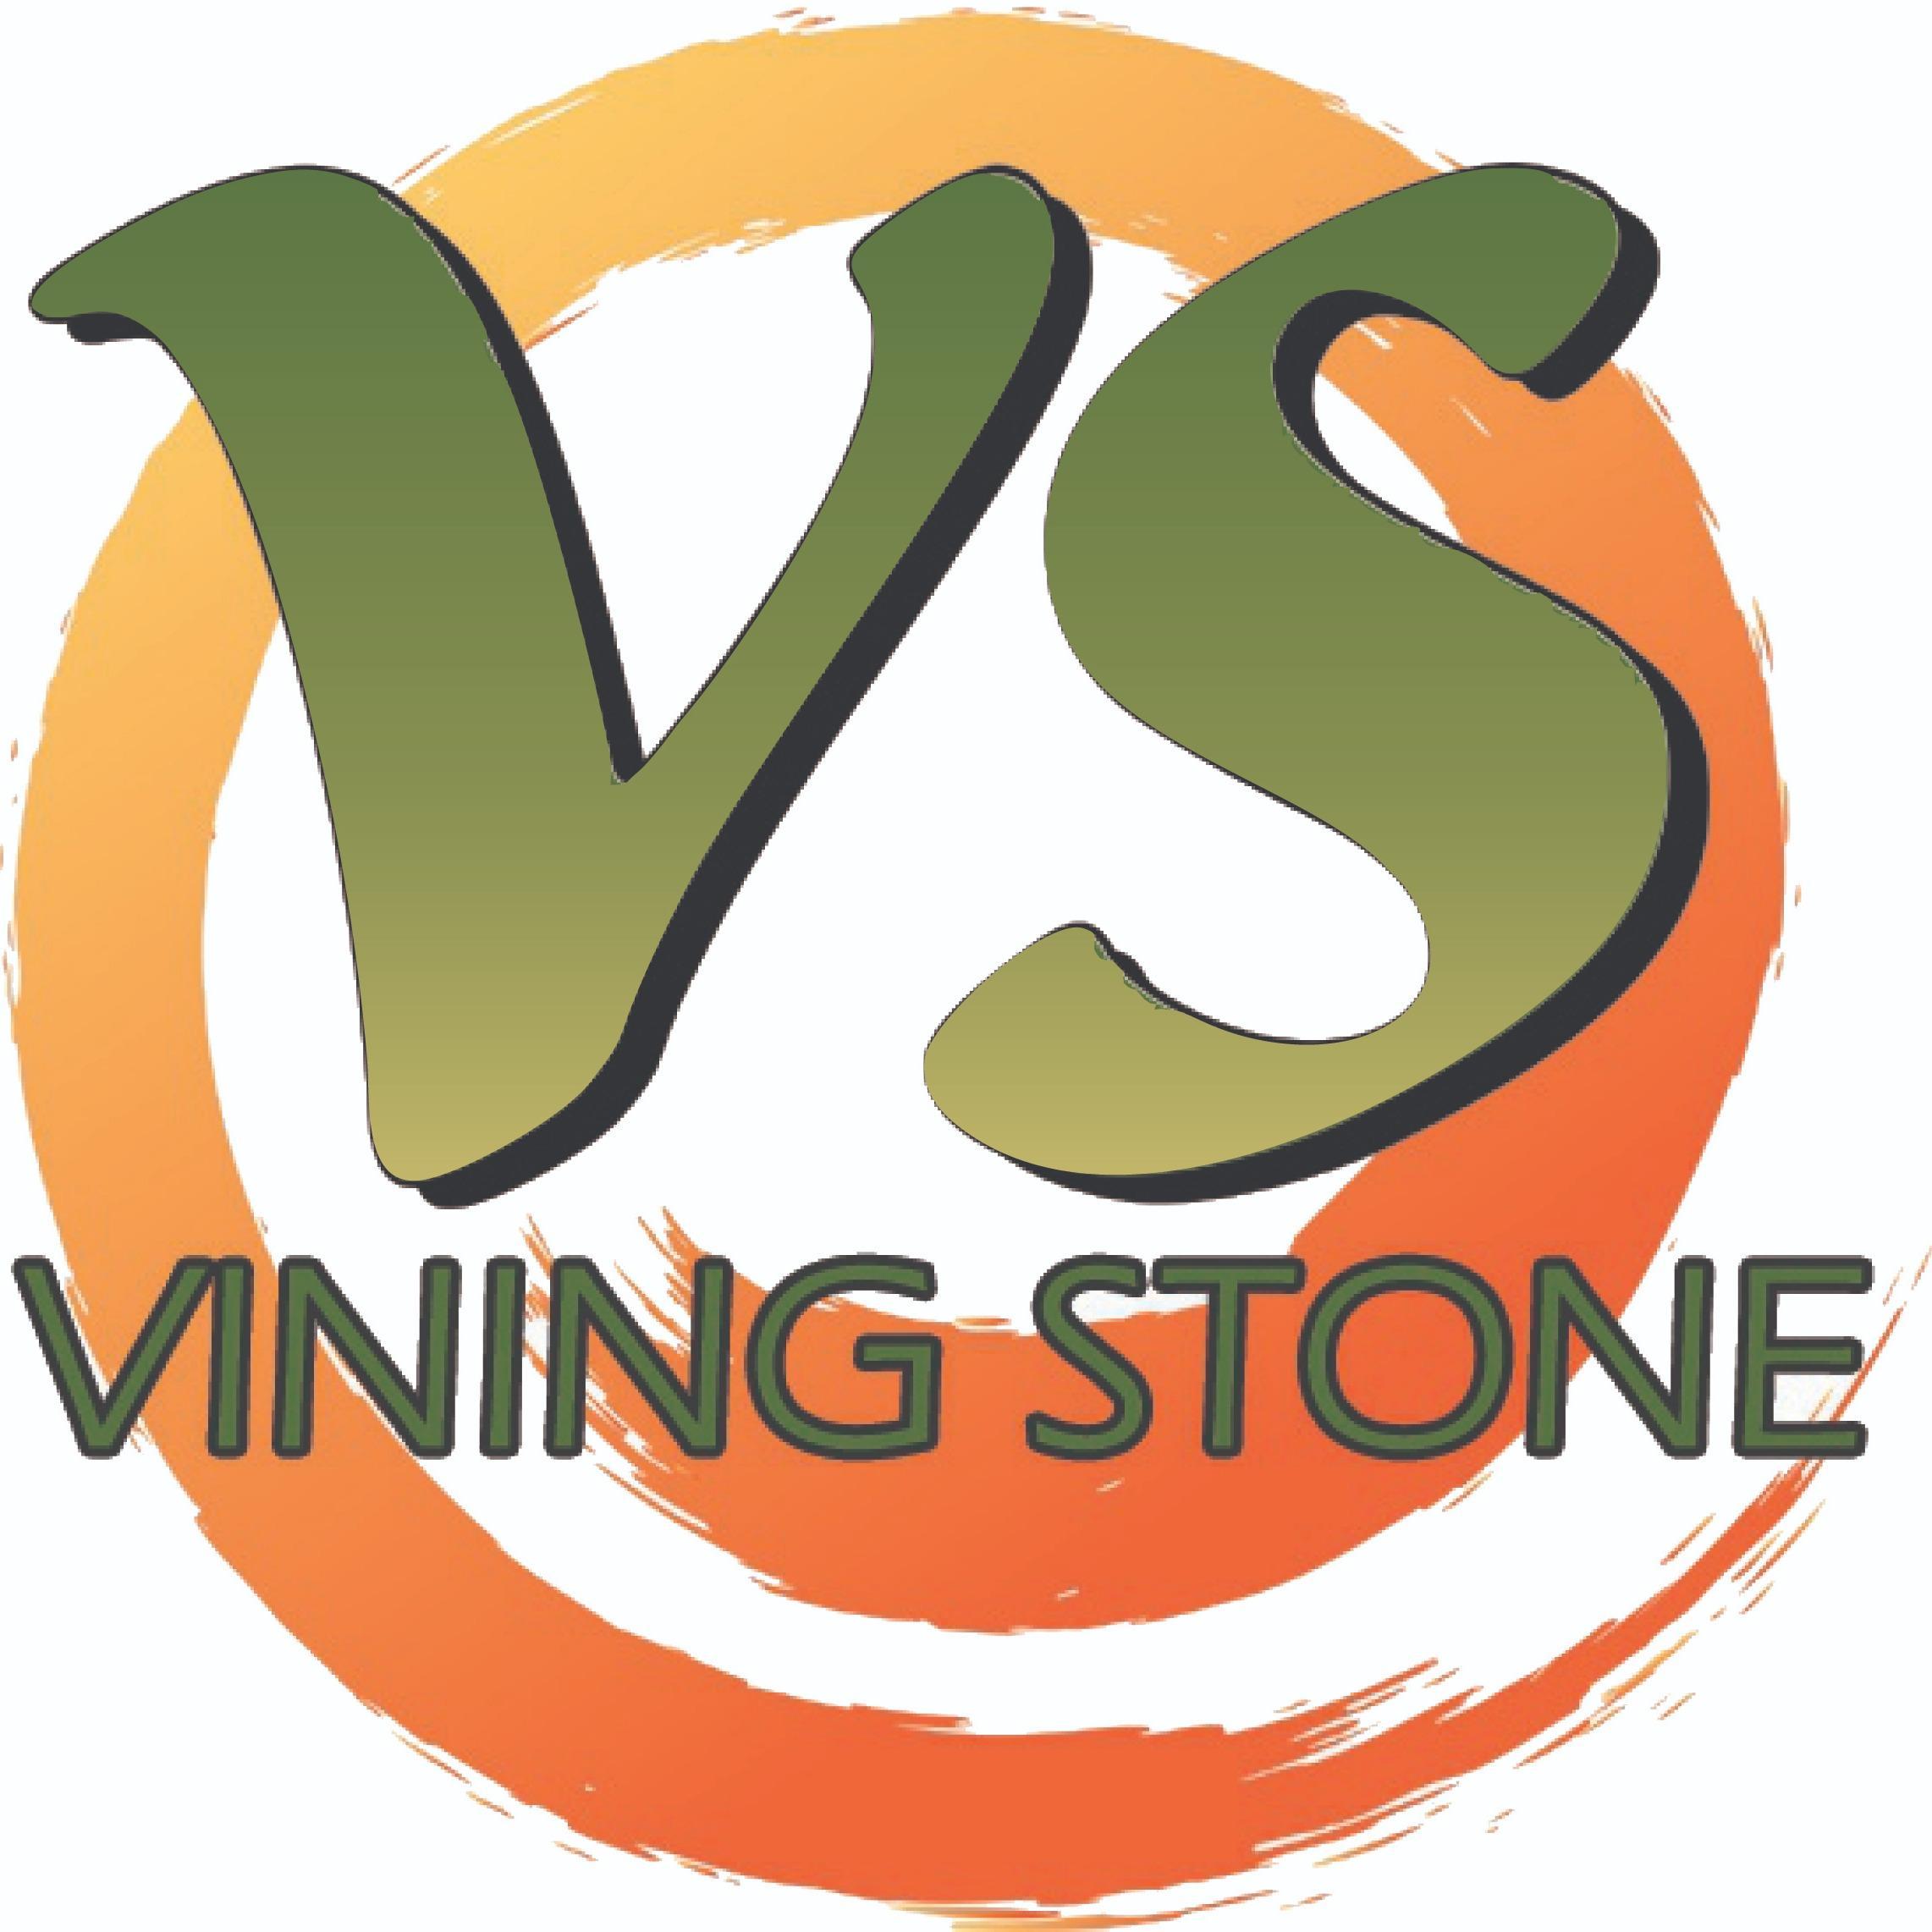 Vining Stone